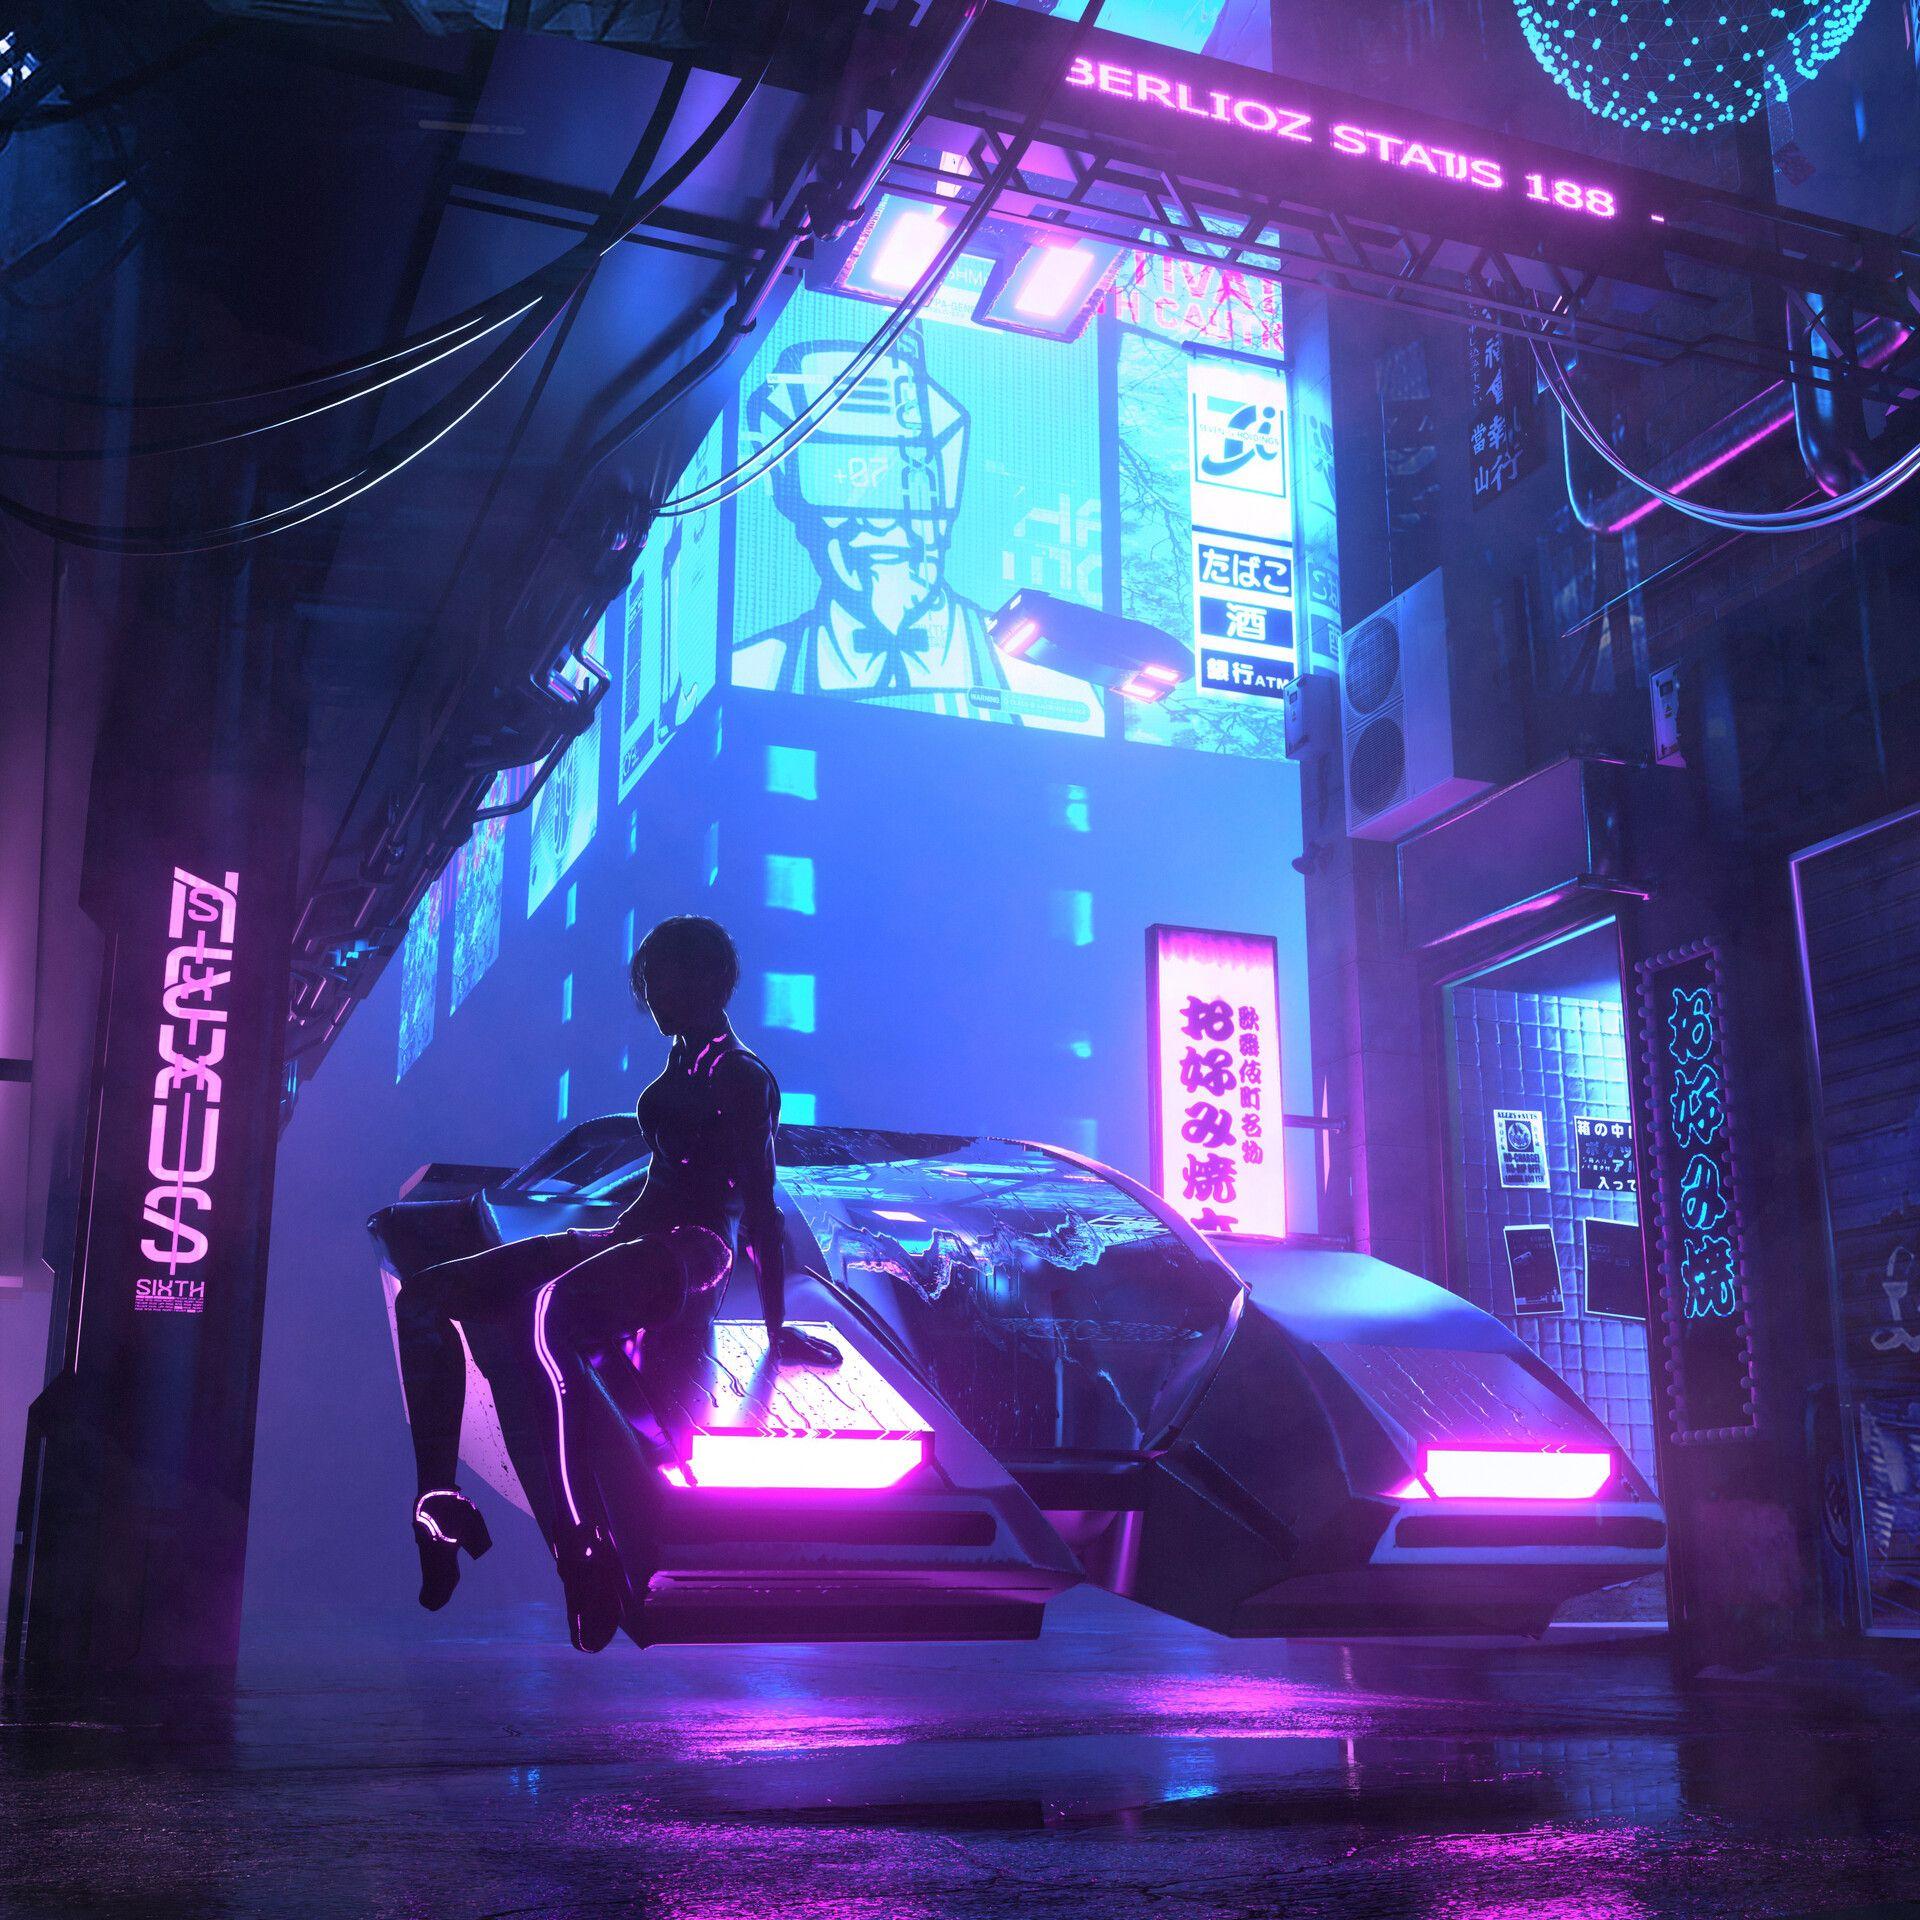 Cyberpunk aesthetic image by nokfyt on cyberpunk